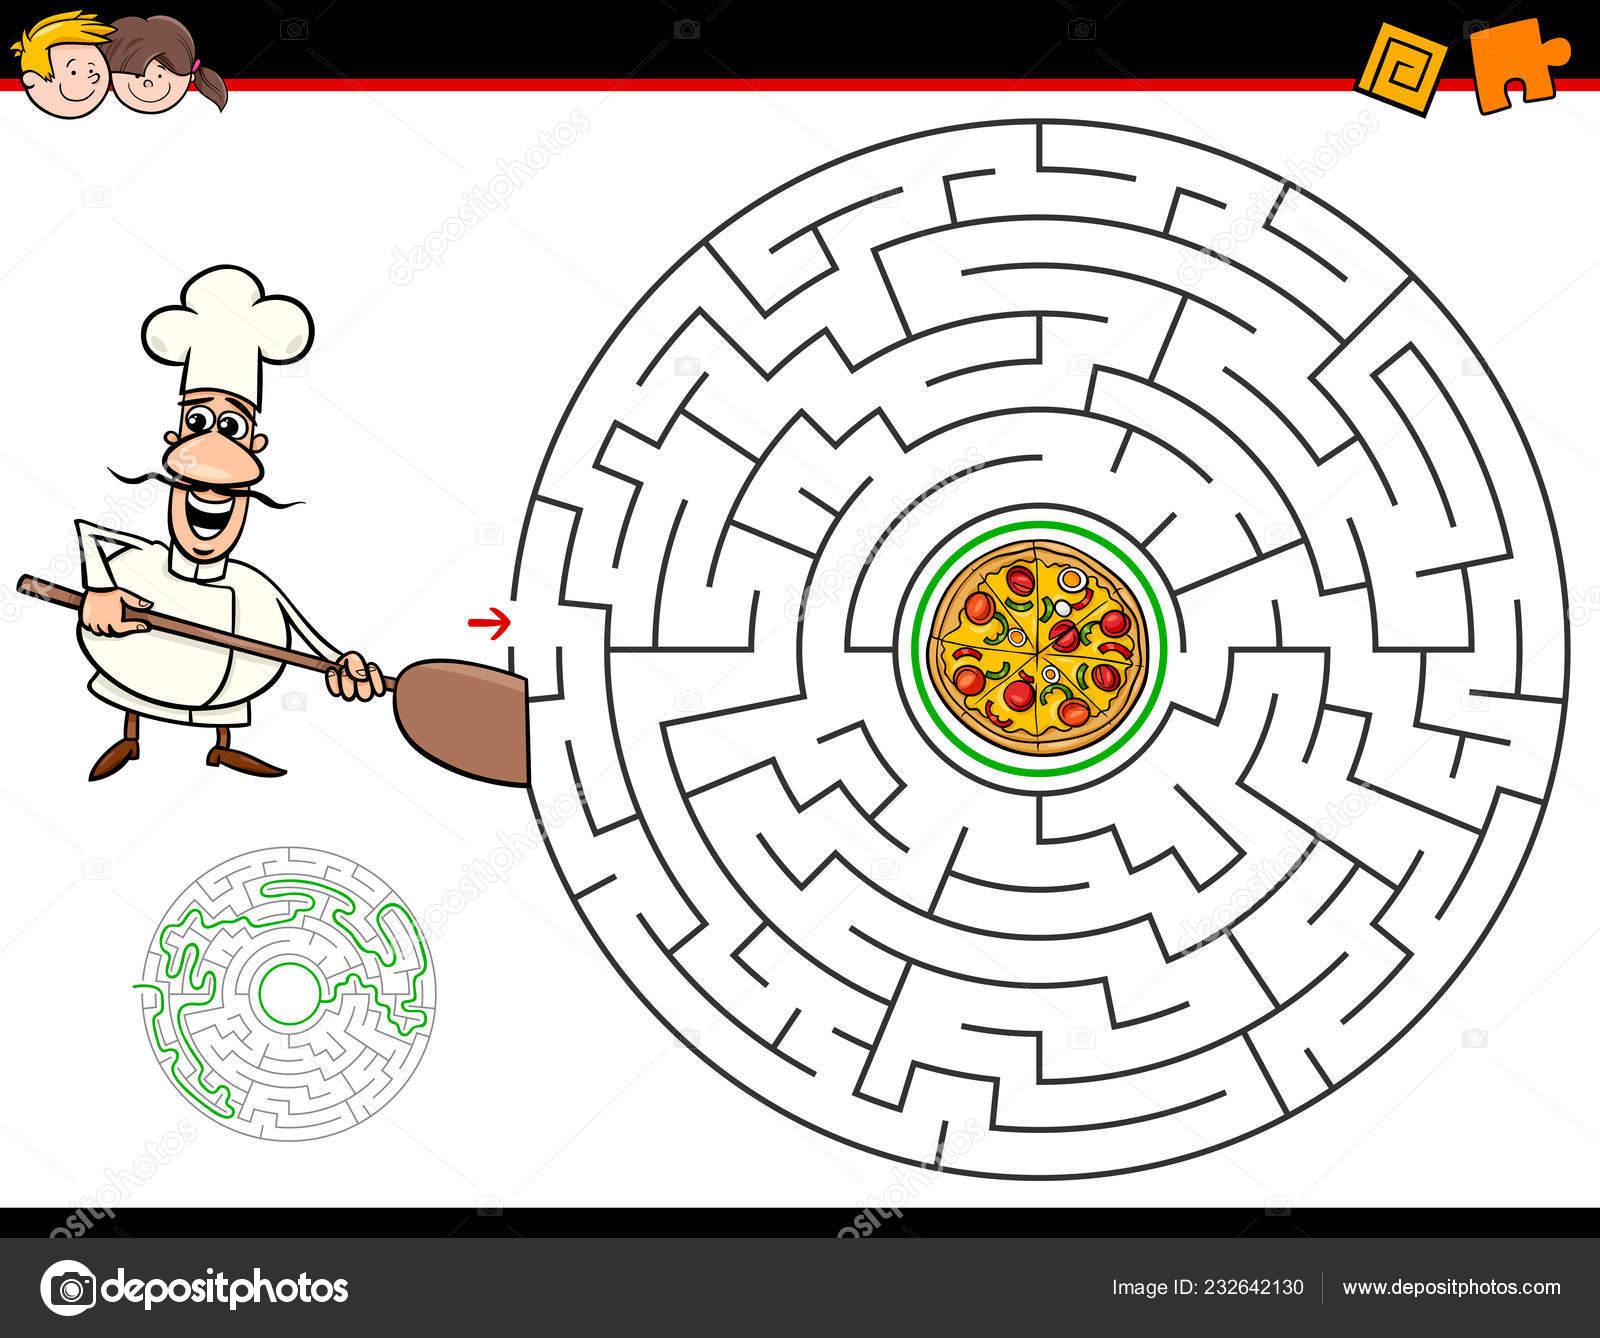 Cartoon Illustration Education Maze Labyrinth Activity